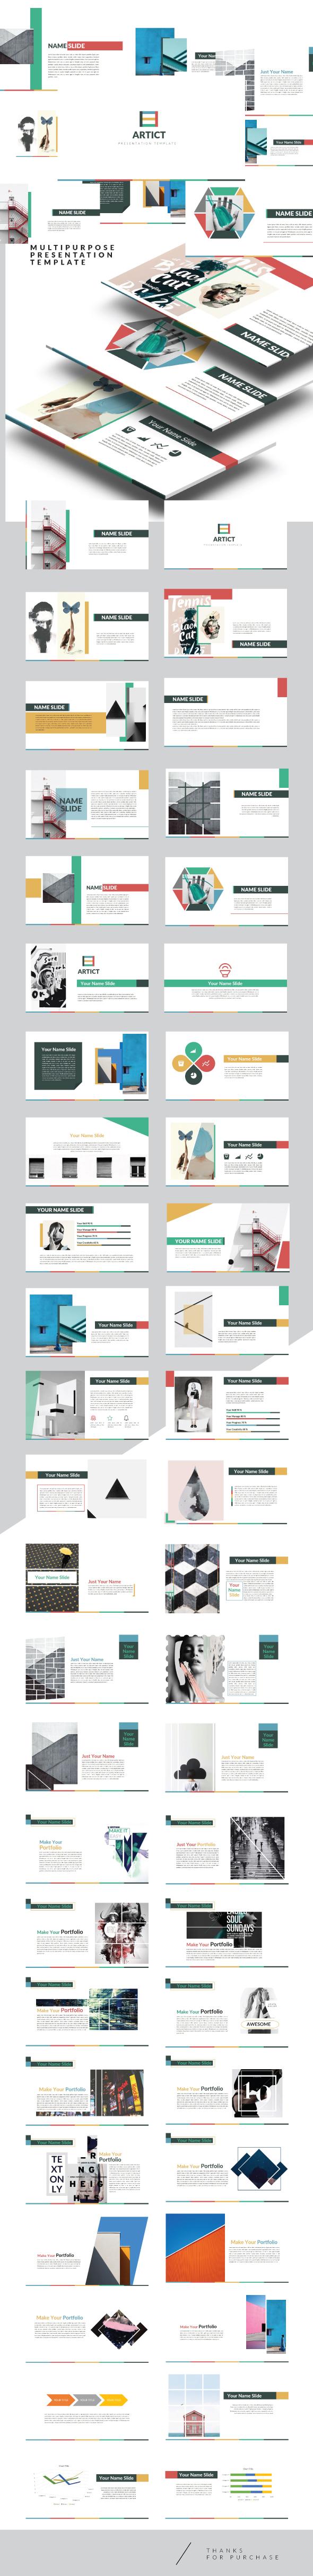 Artic - Multipurpose Powerpoint Creative template - Creative PowerPoint Templates